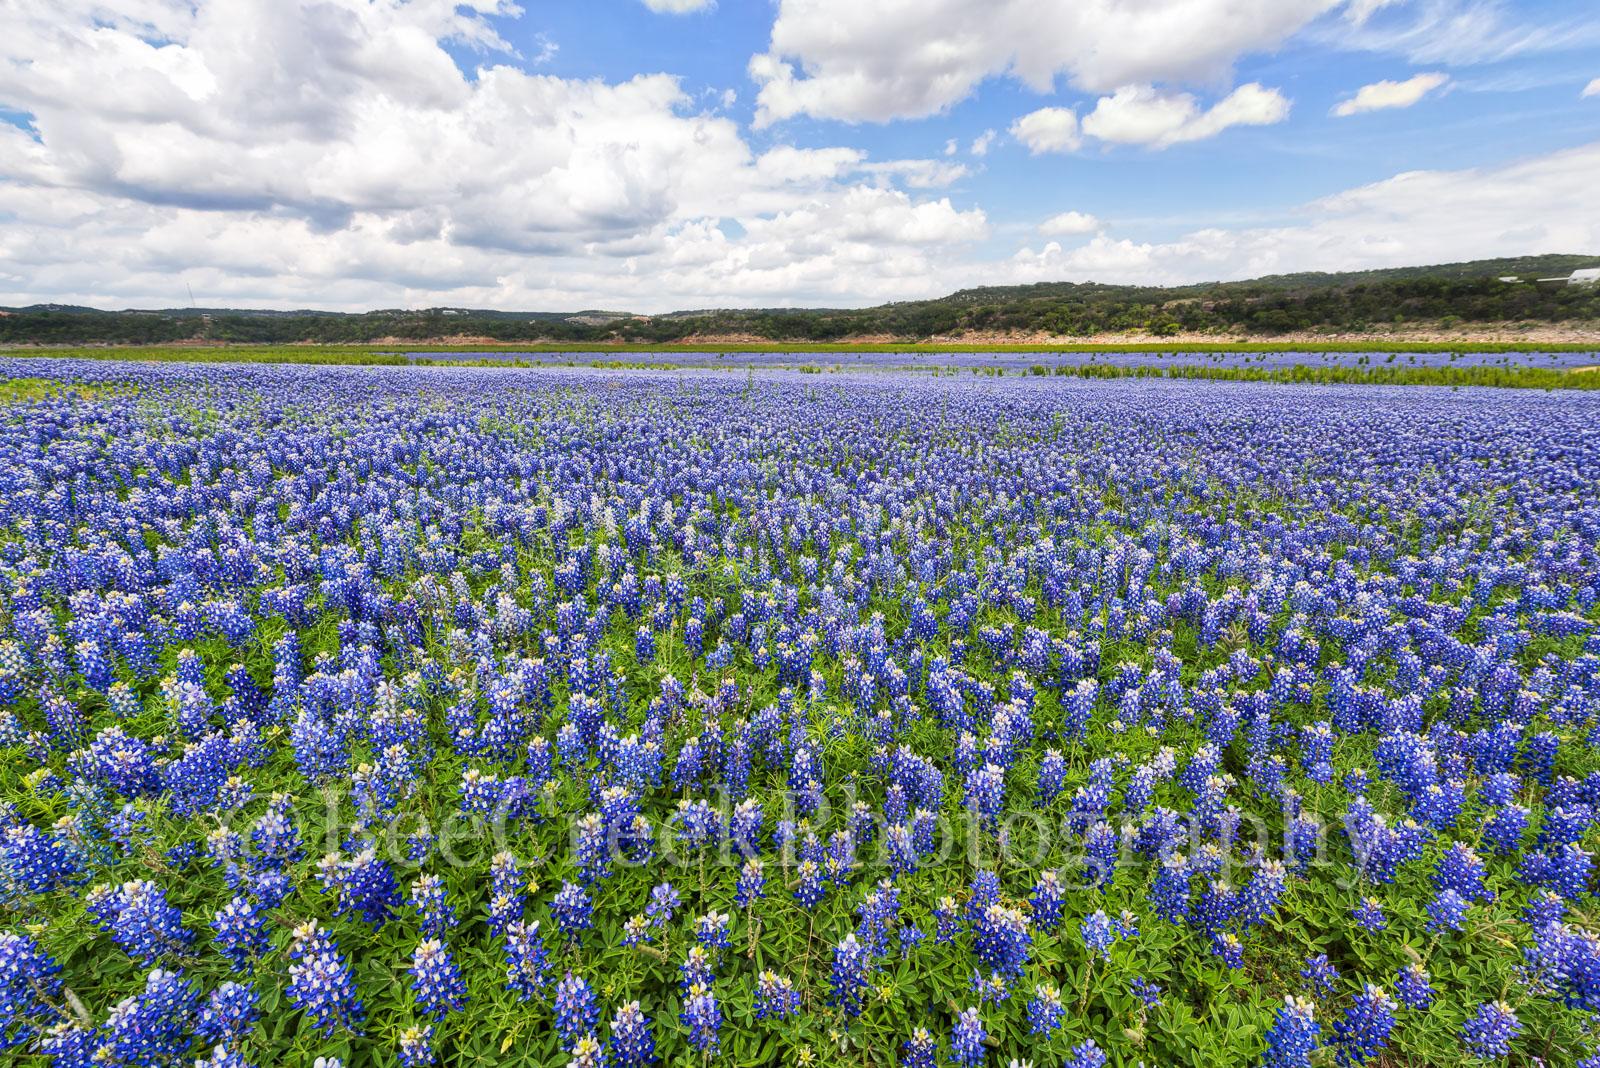 Bluebonnets, blue bells, blue bonnets, flowers, bluebonnet landscape, blue, texas bluebonnets, wildflowers, photo